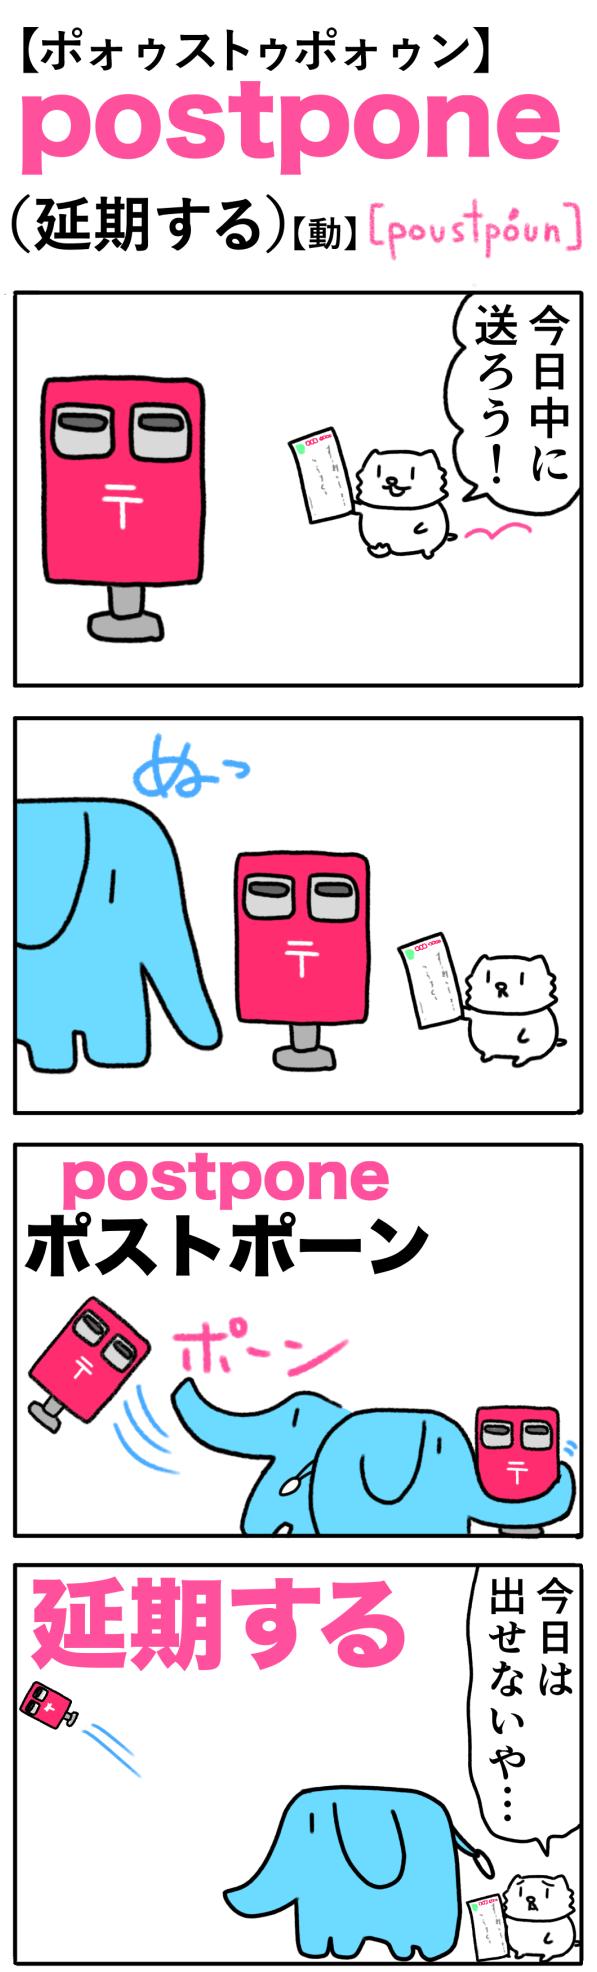 postpone(延期する)の語呂合わせ英単語